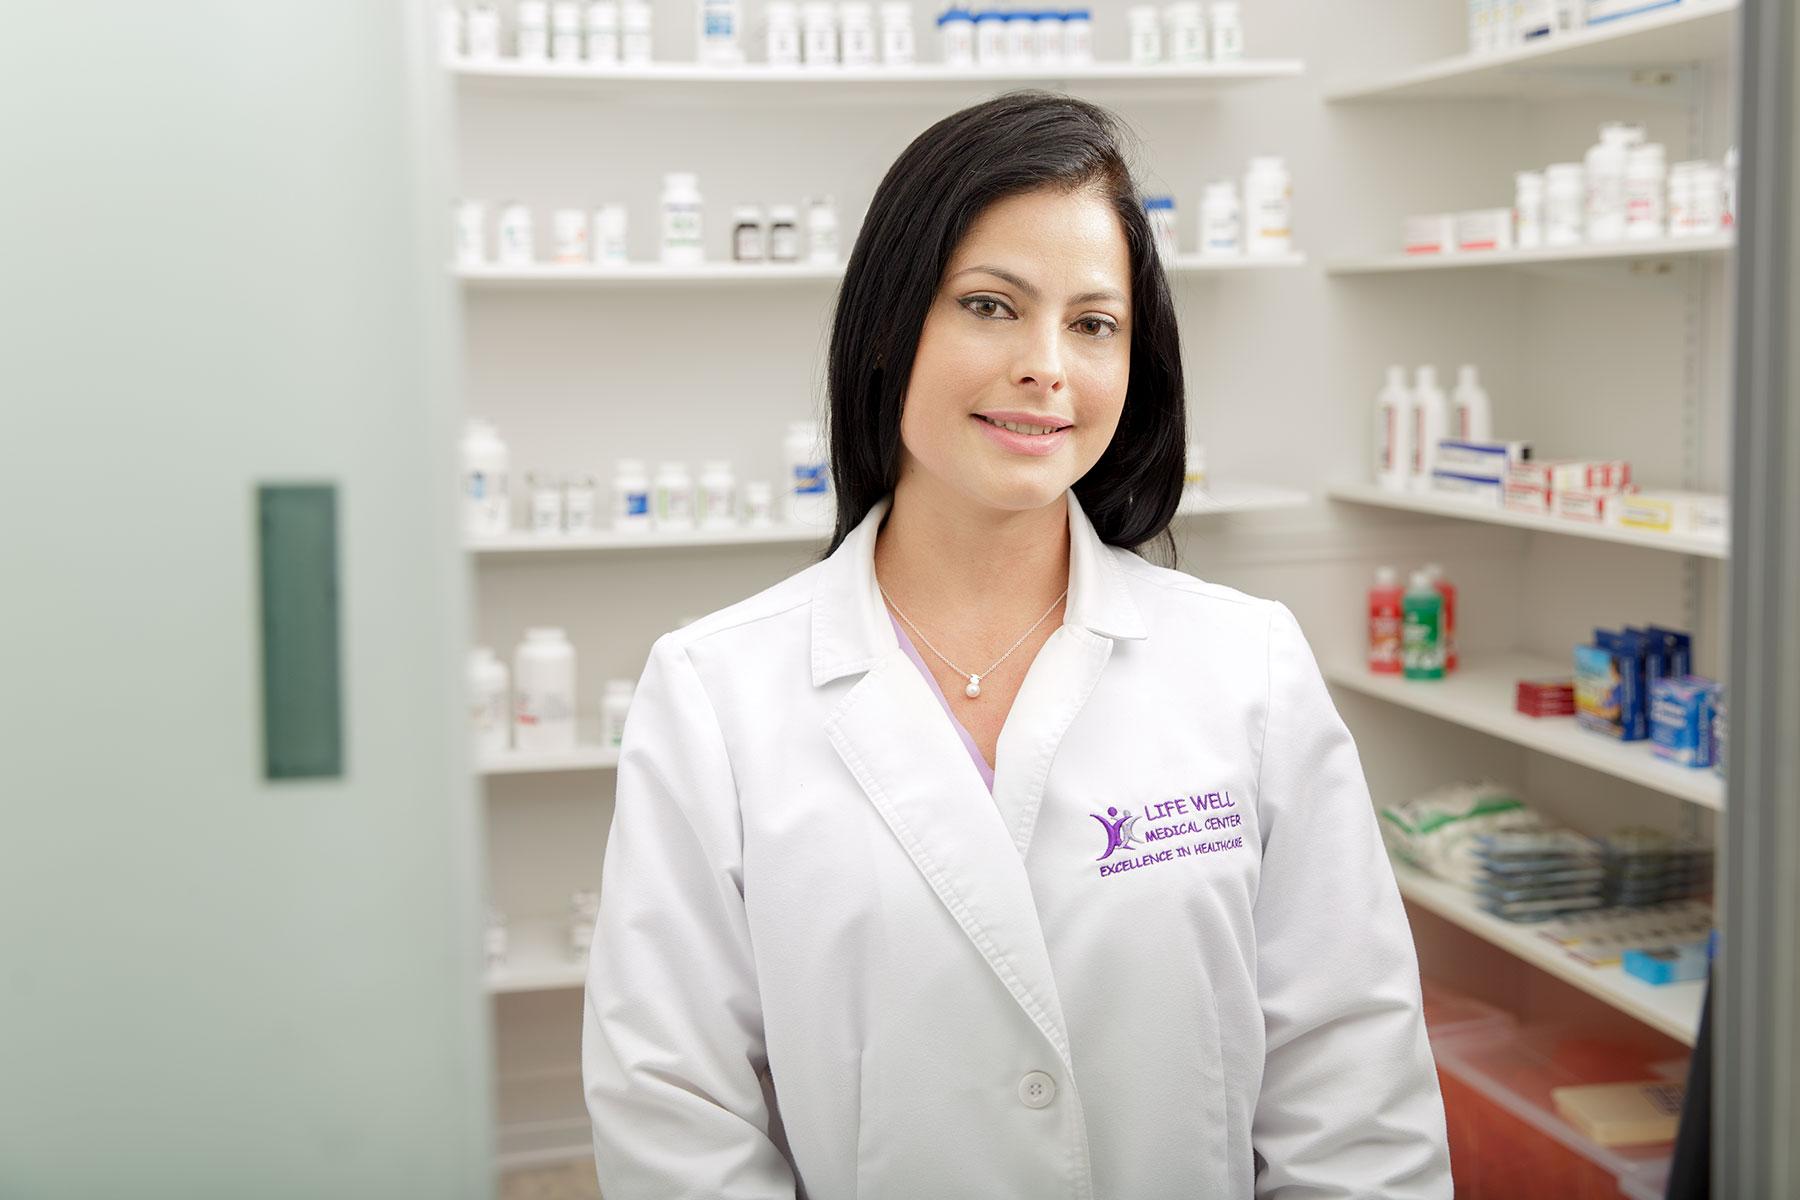 Miami_lifestyle_Photographer_David_Gonzalez_portrait_healthcare_pharma_pharmacy.jpg